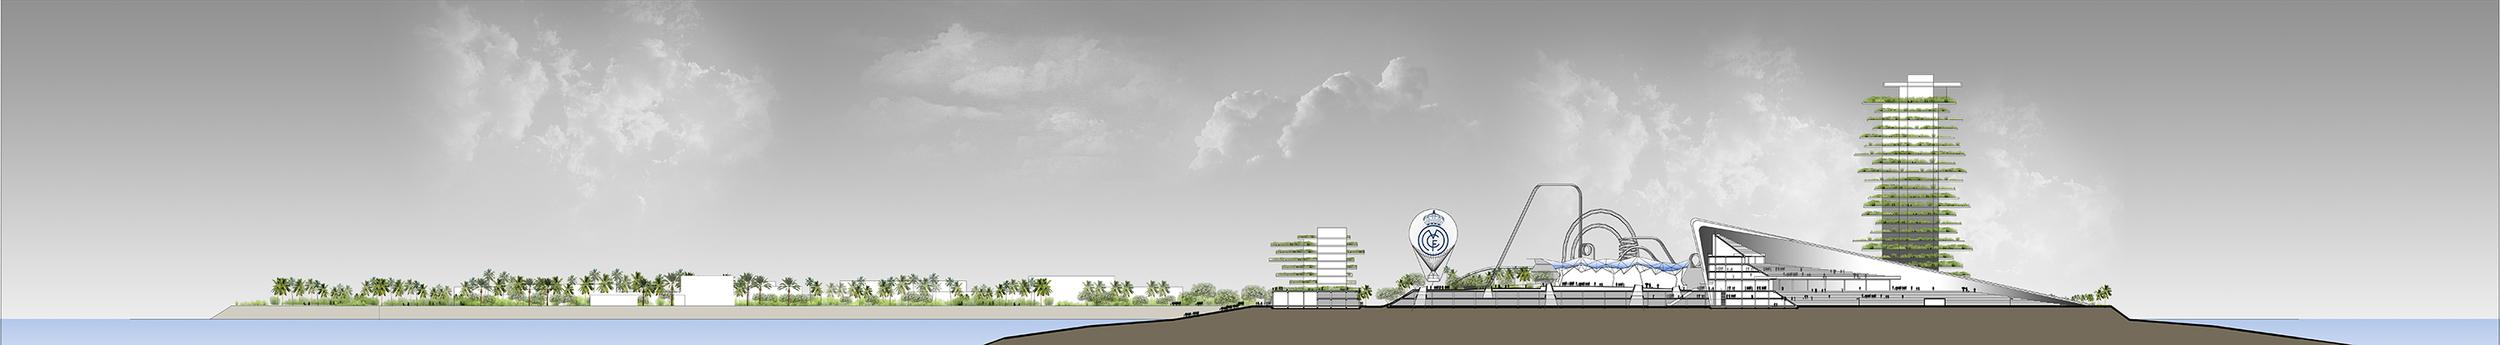 BOIFFILS-Real Madrid Resort Island-Section-02.jpg